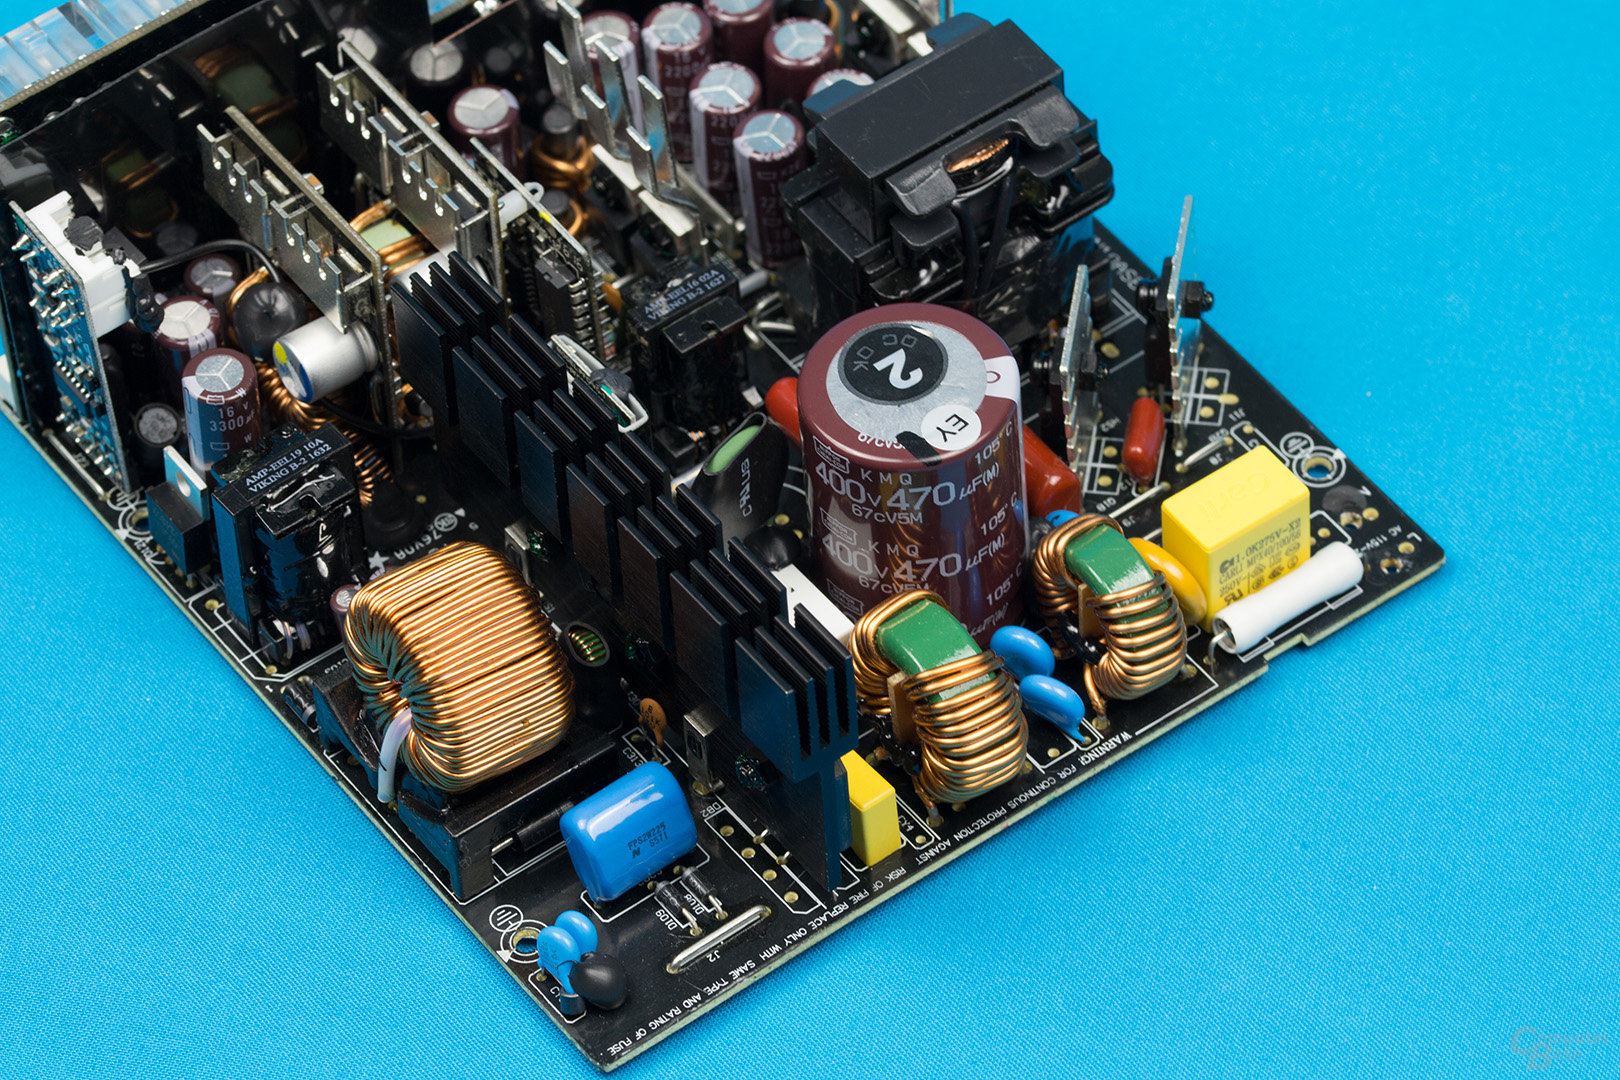 Super Flower Leadex II Gold 650W – APFC und LLC-Halbbrücke